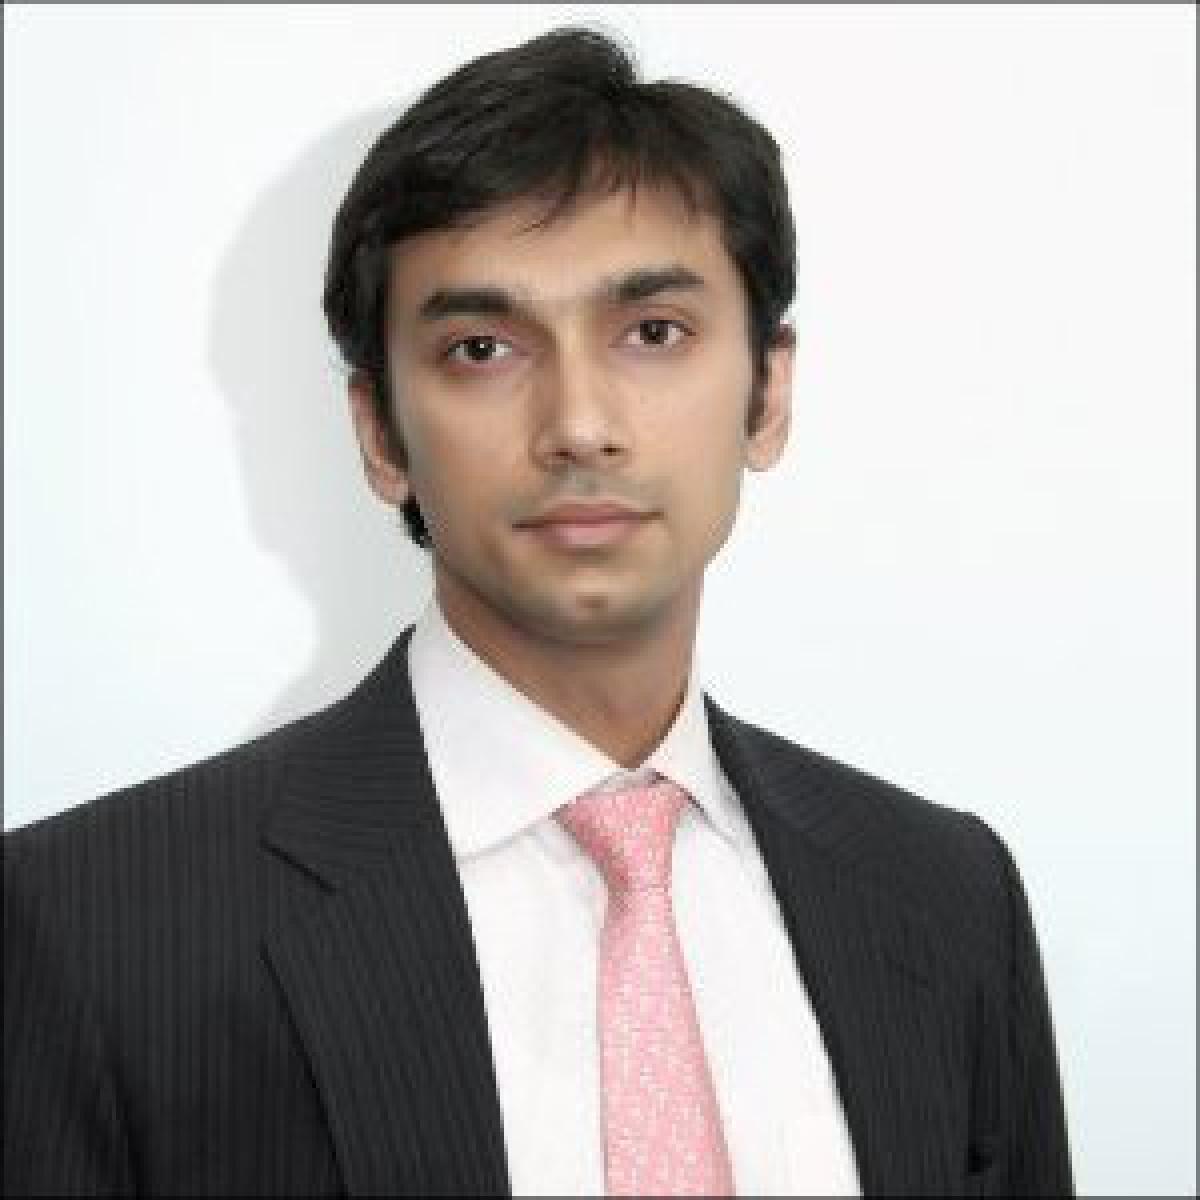 Chandramohan Mehra to join Bajaj Allianz Life Insurance as CMO